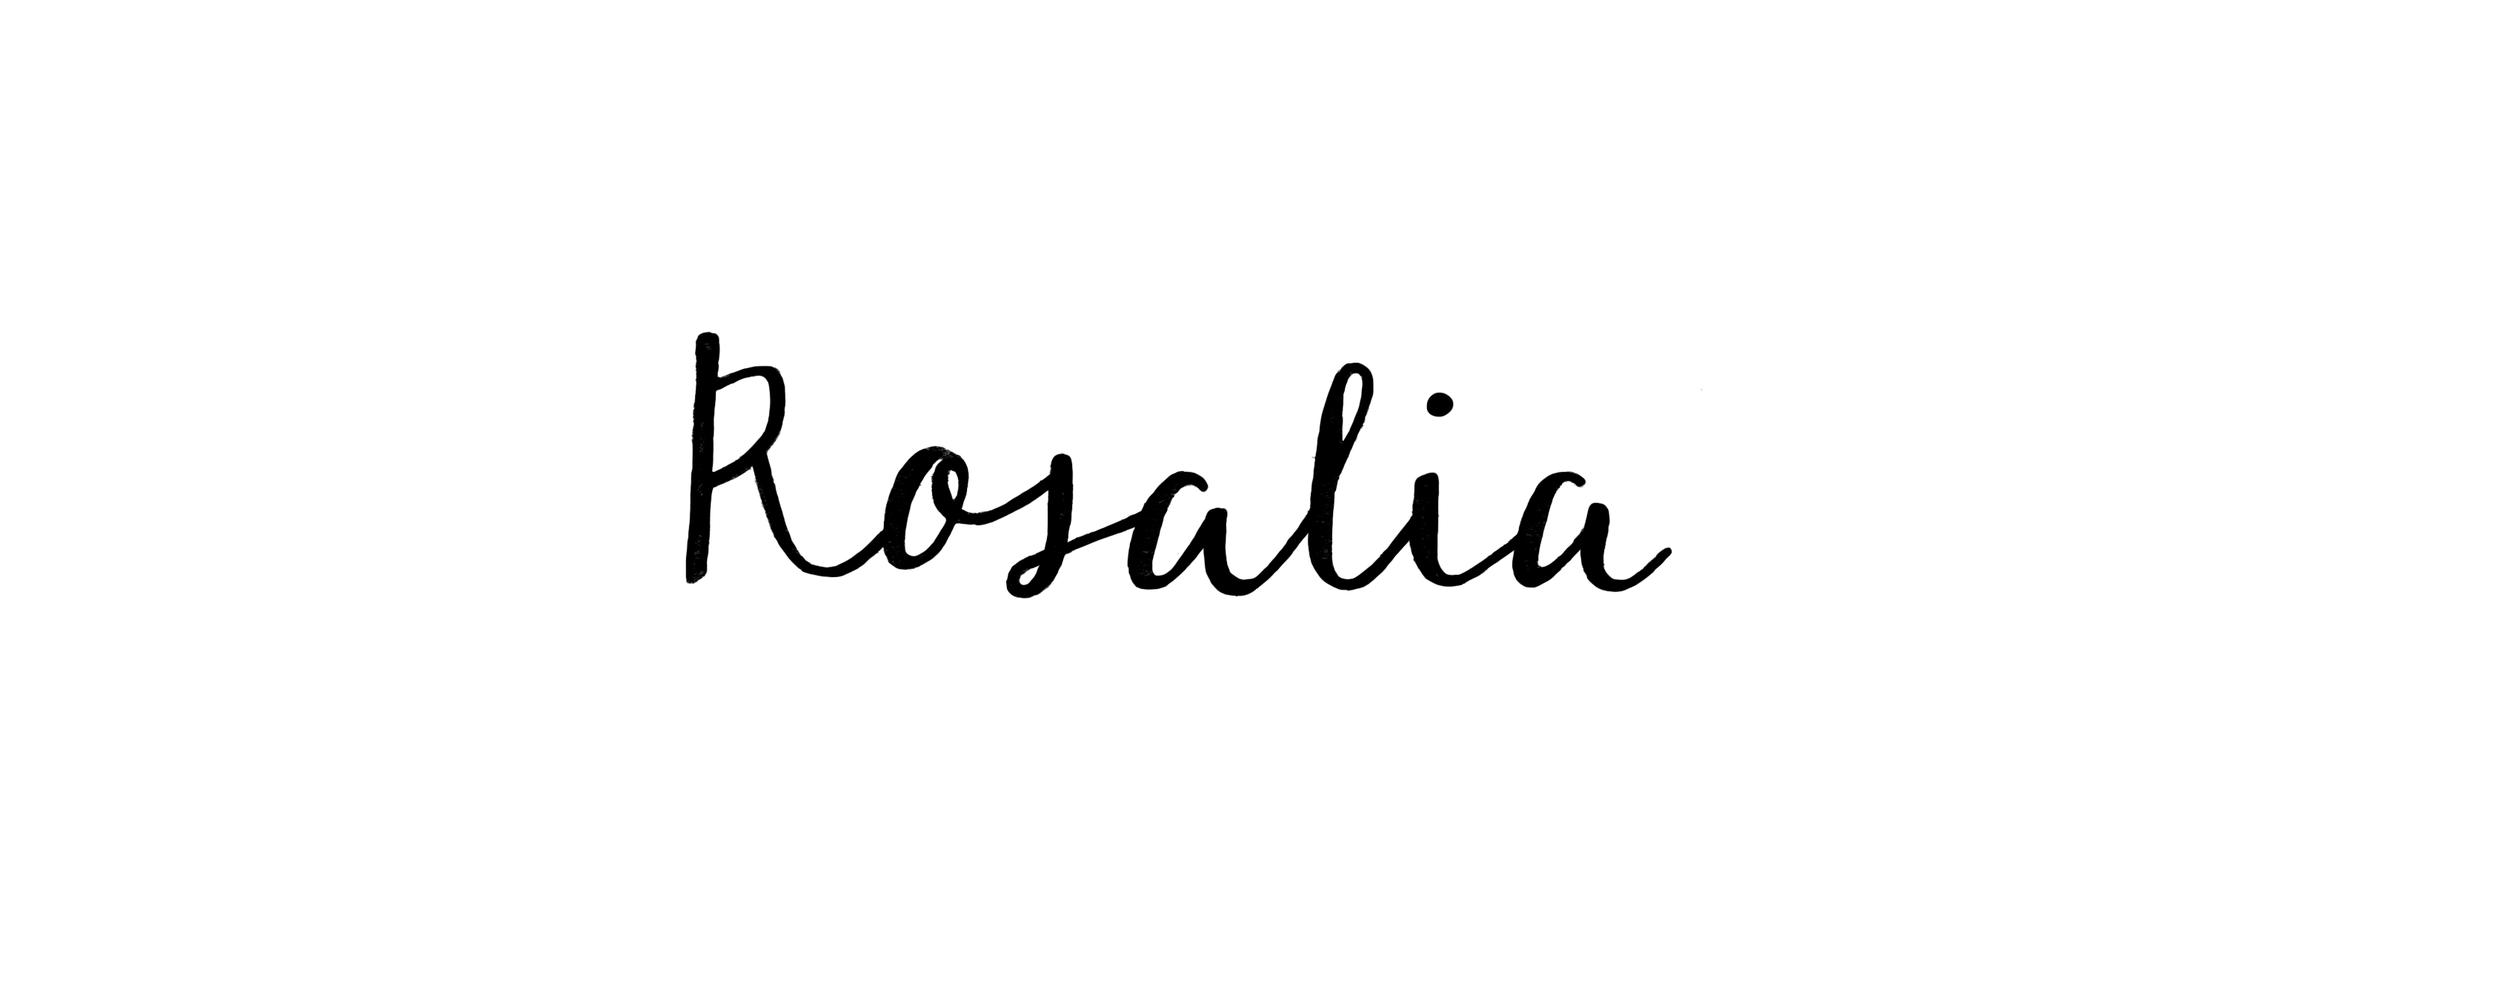 Rosalia.jpg